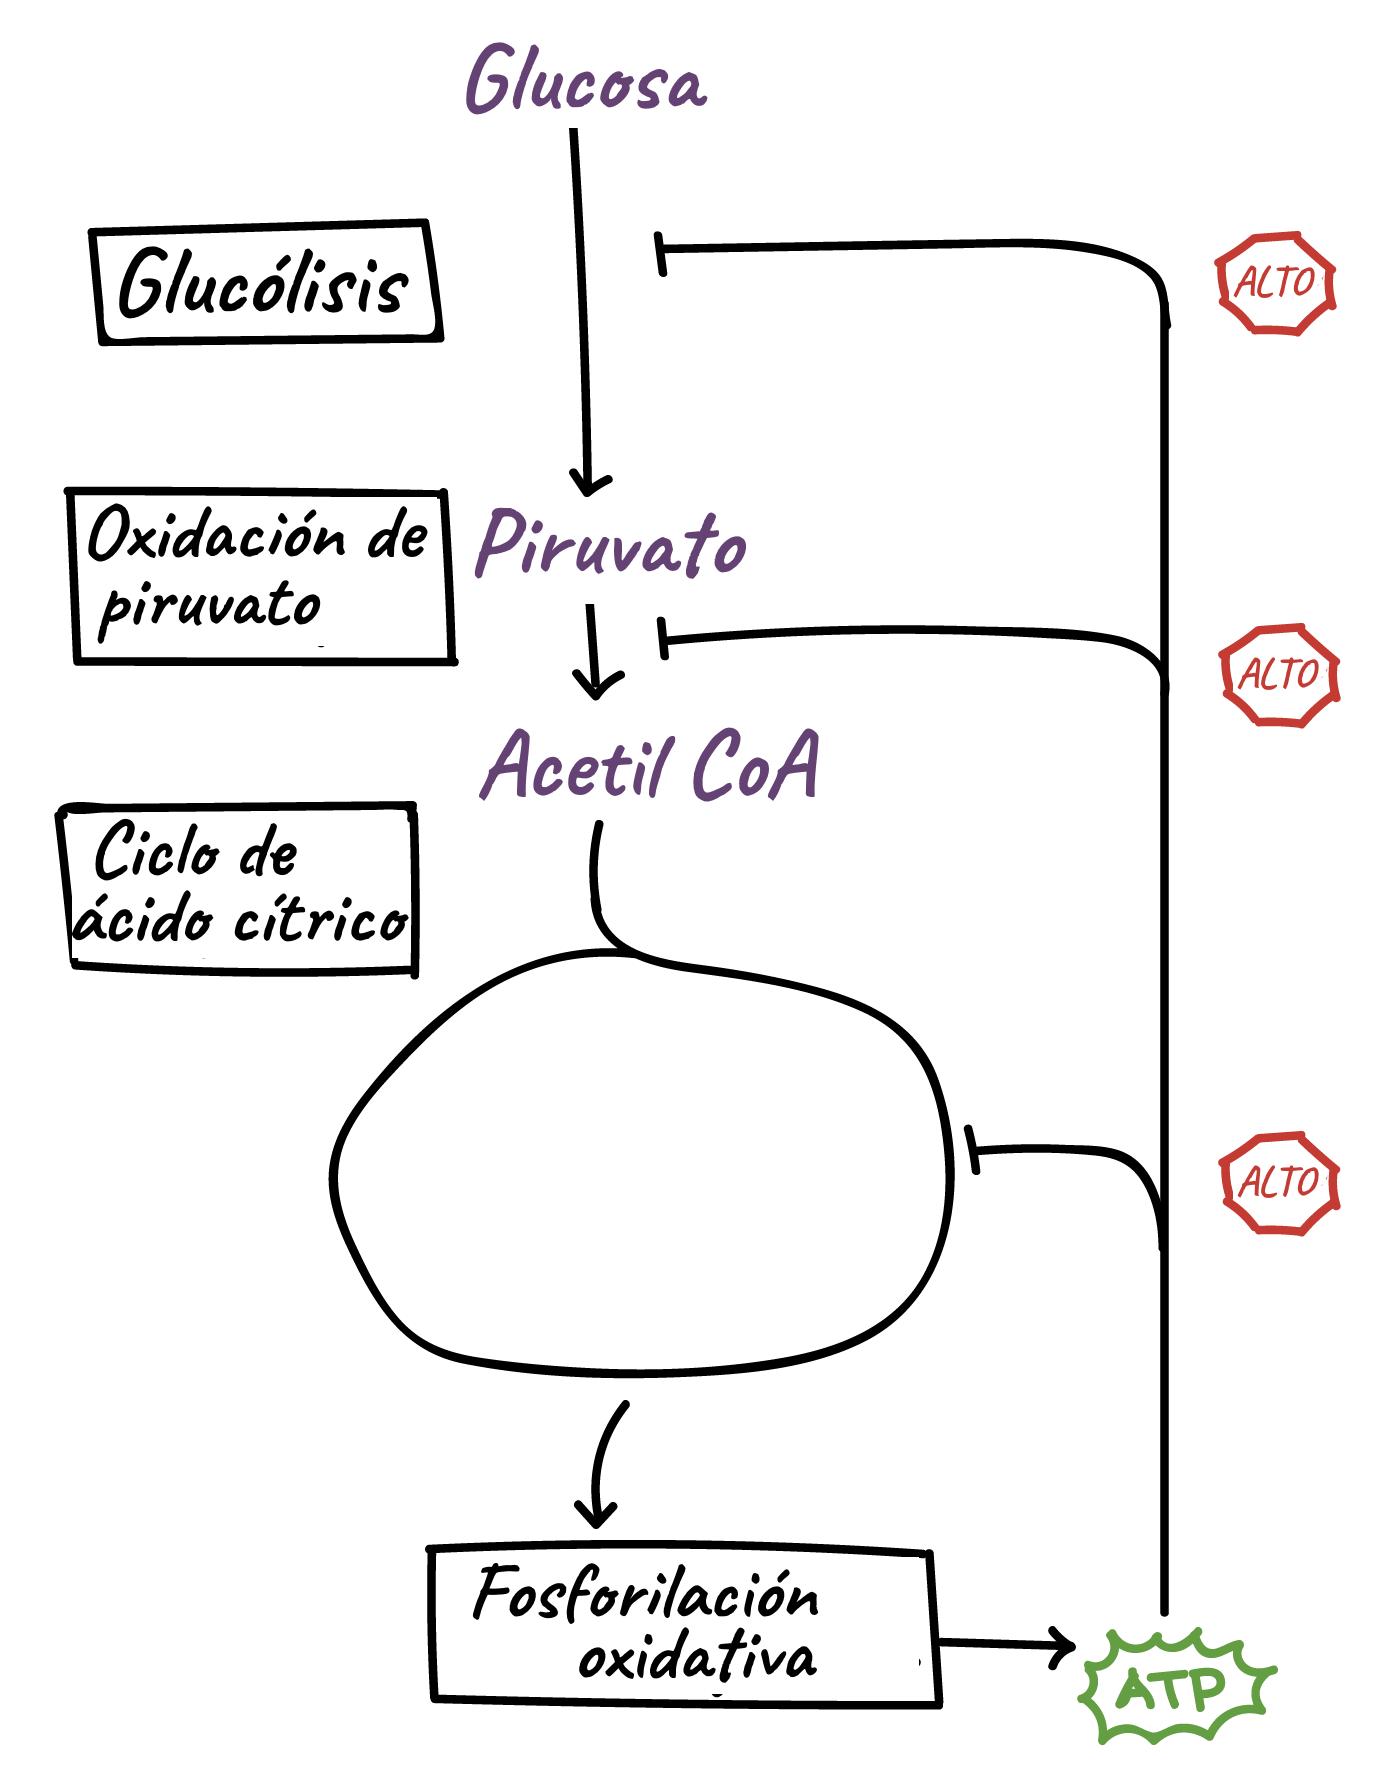 Fermentation and anaerobic respiration | Cellular respiration ...